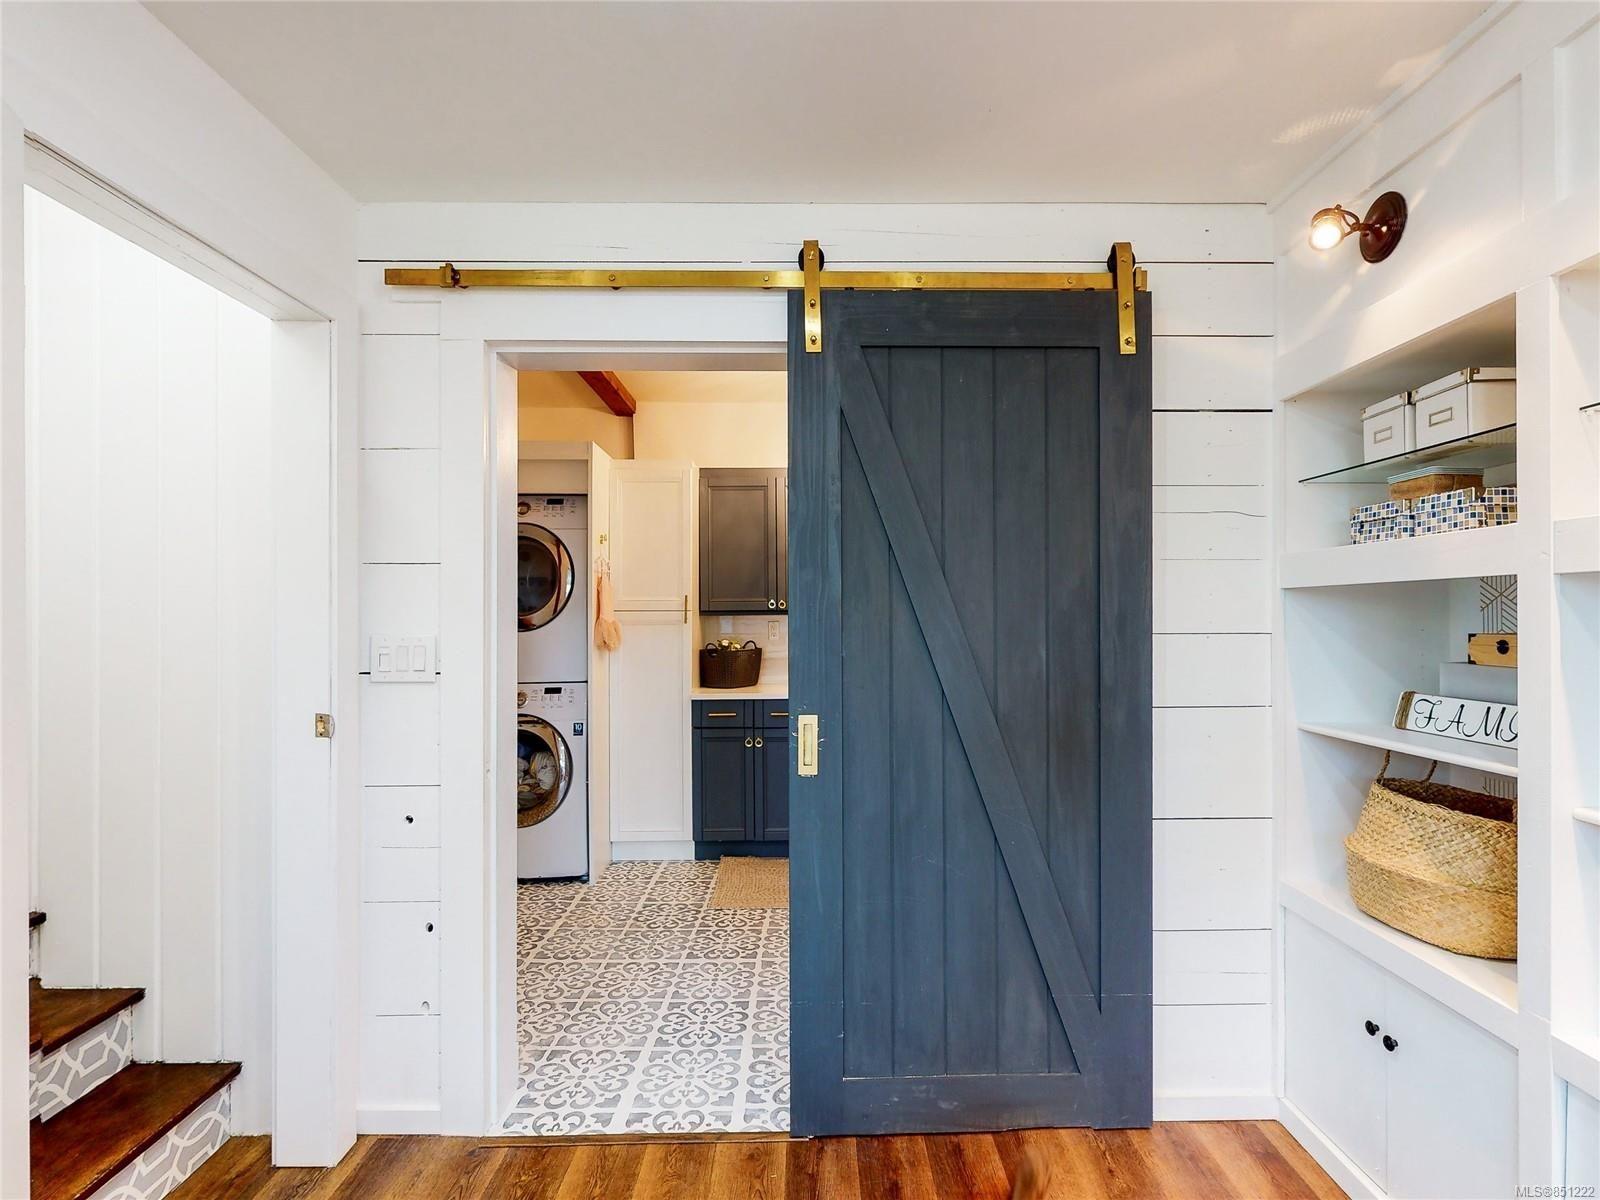 Photo 26: Photos: 2525 11th Ave in : PA Port Alberni House for sale (Port Alberni)  : MLS®# 851222